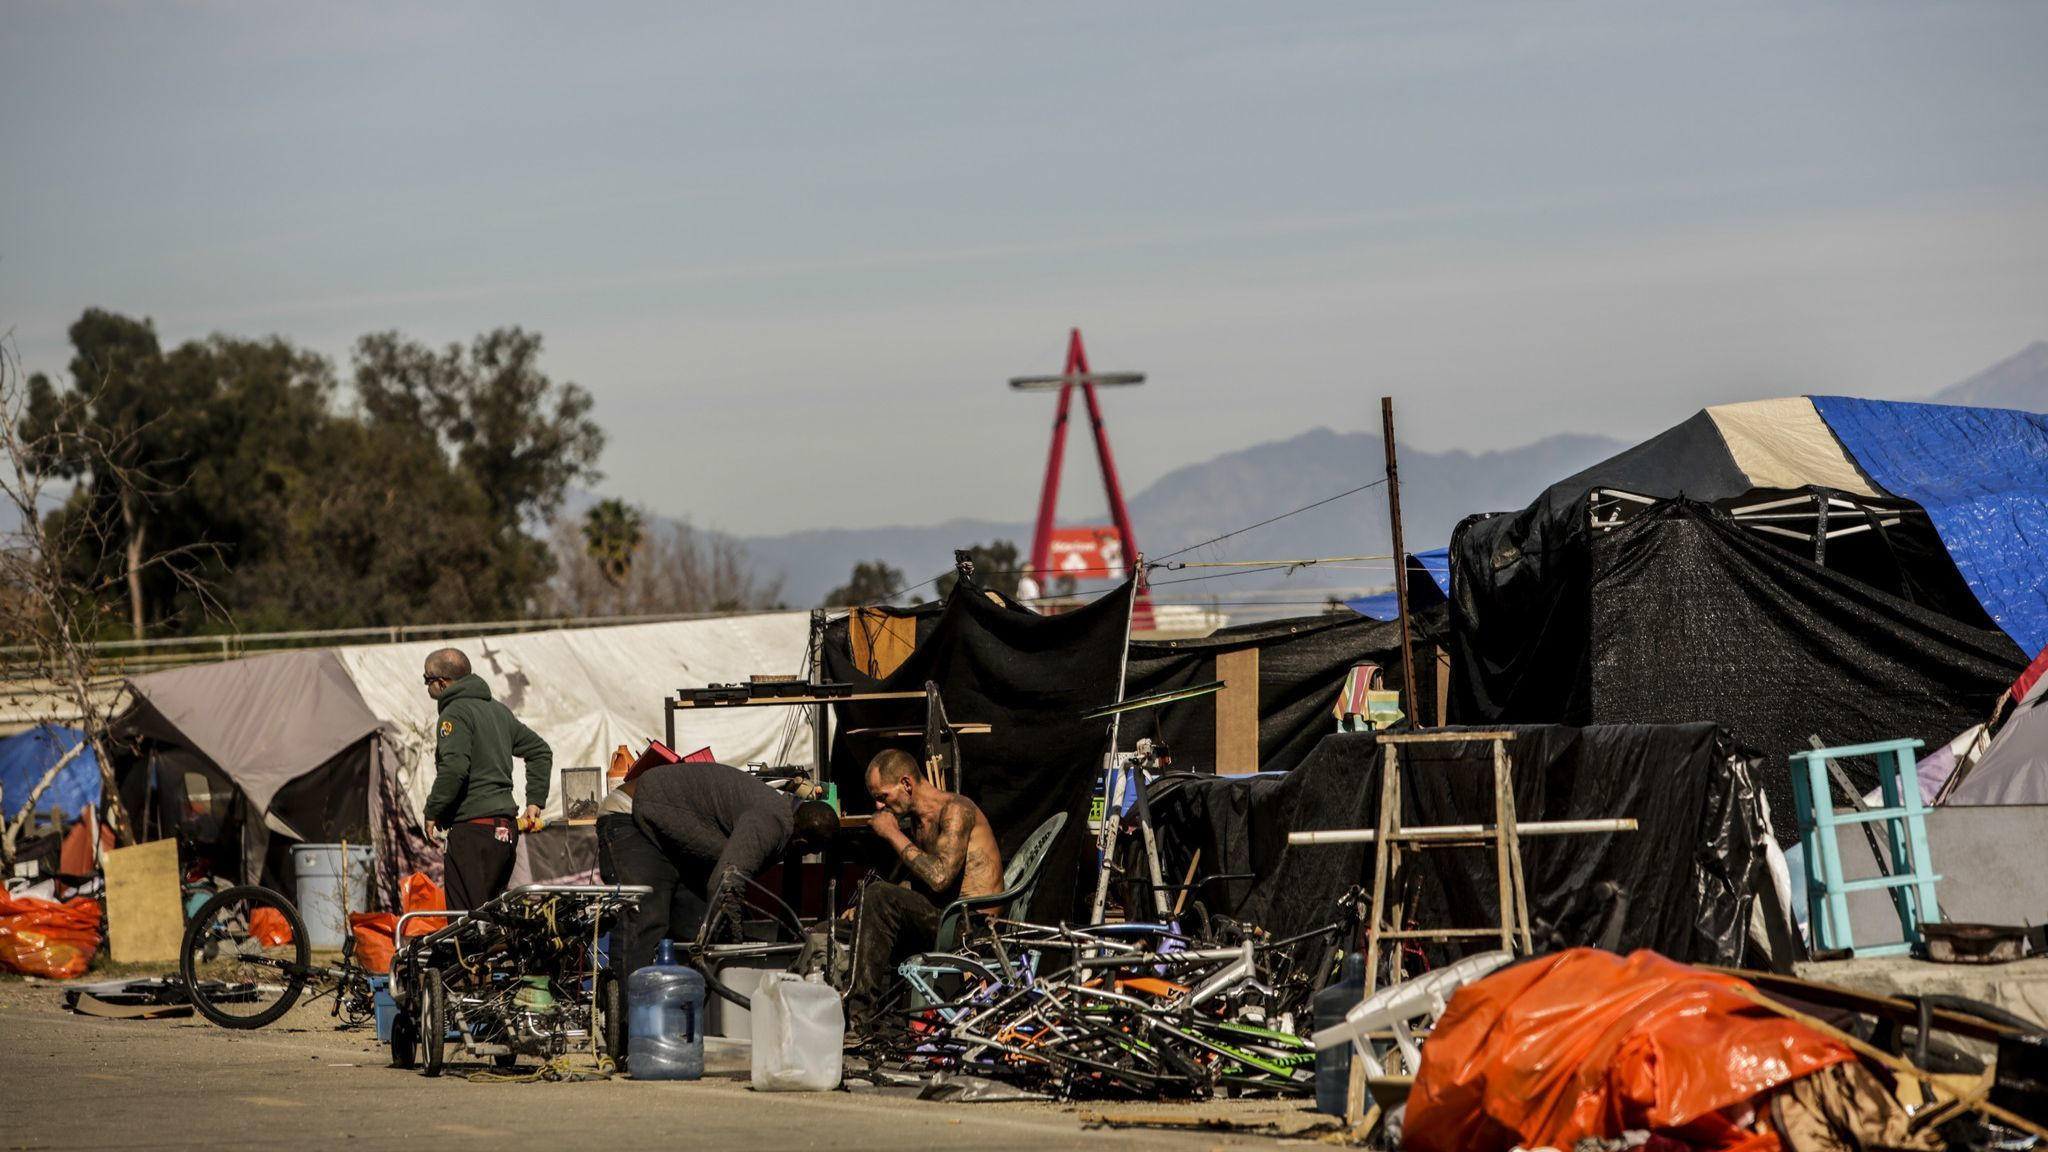 Costa Mesa settles lawsuit over homeless along Santa Ana River